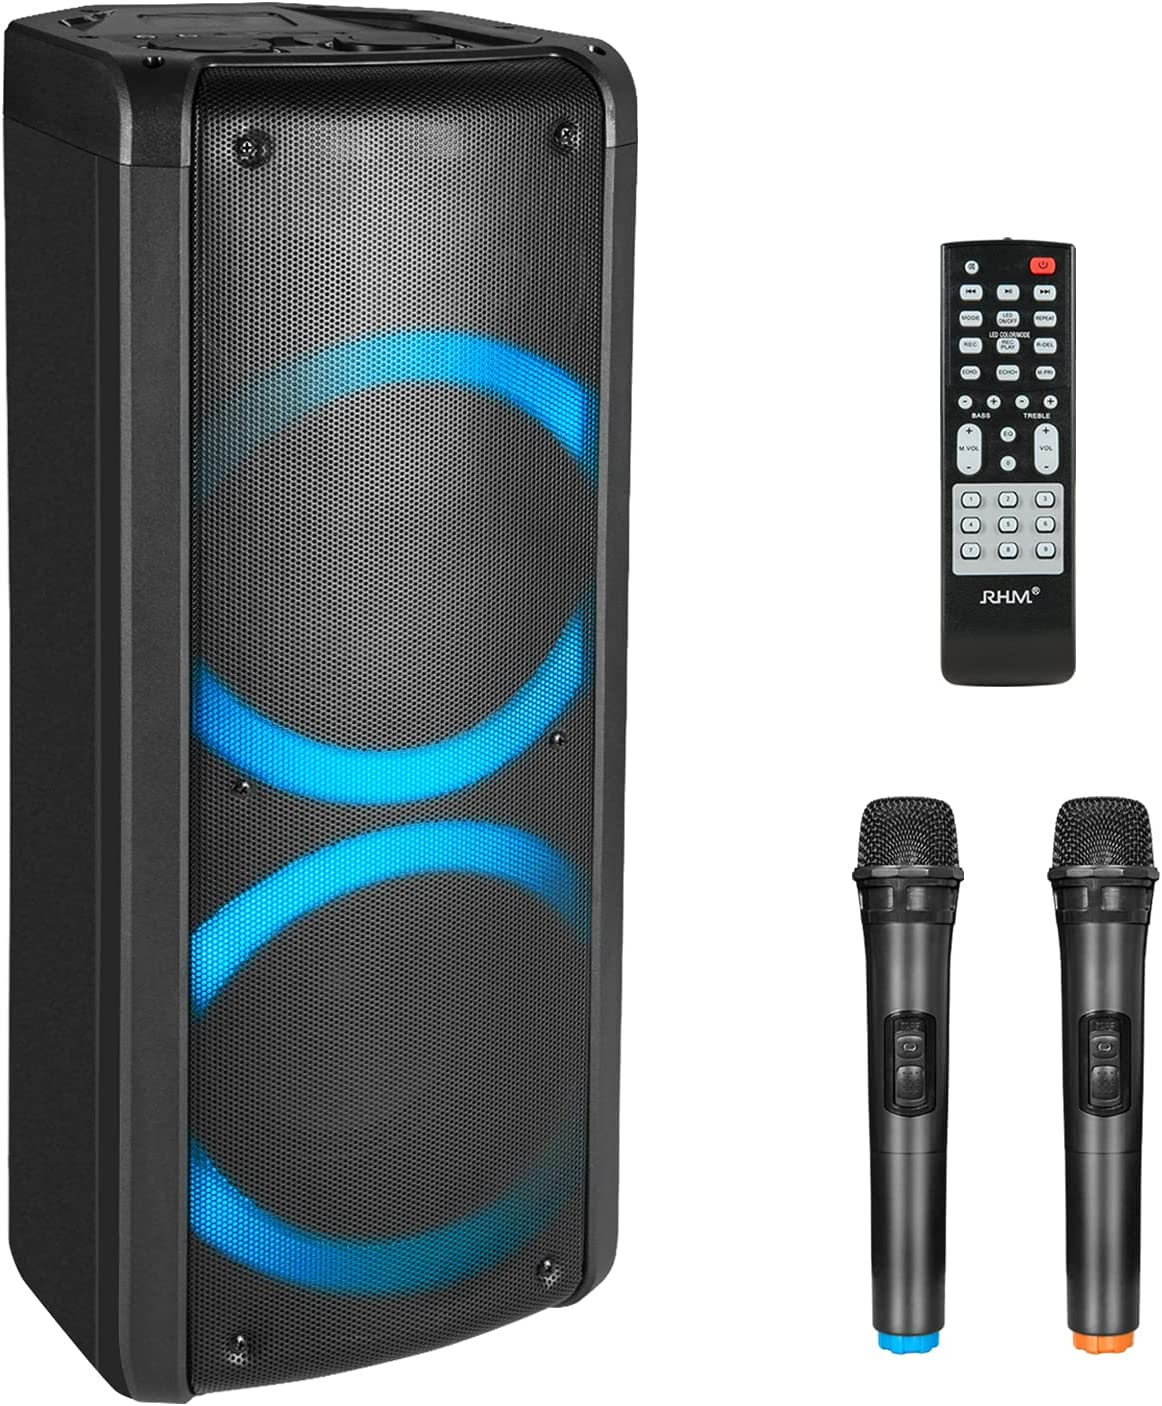 RHM Karaoke Machine for Adults Portable Bluetooth Phoenix Mall PA Max 53% OFF Kids Speak